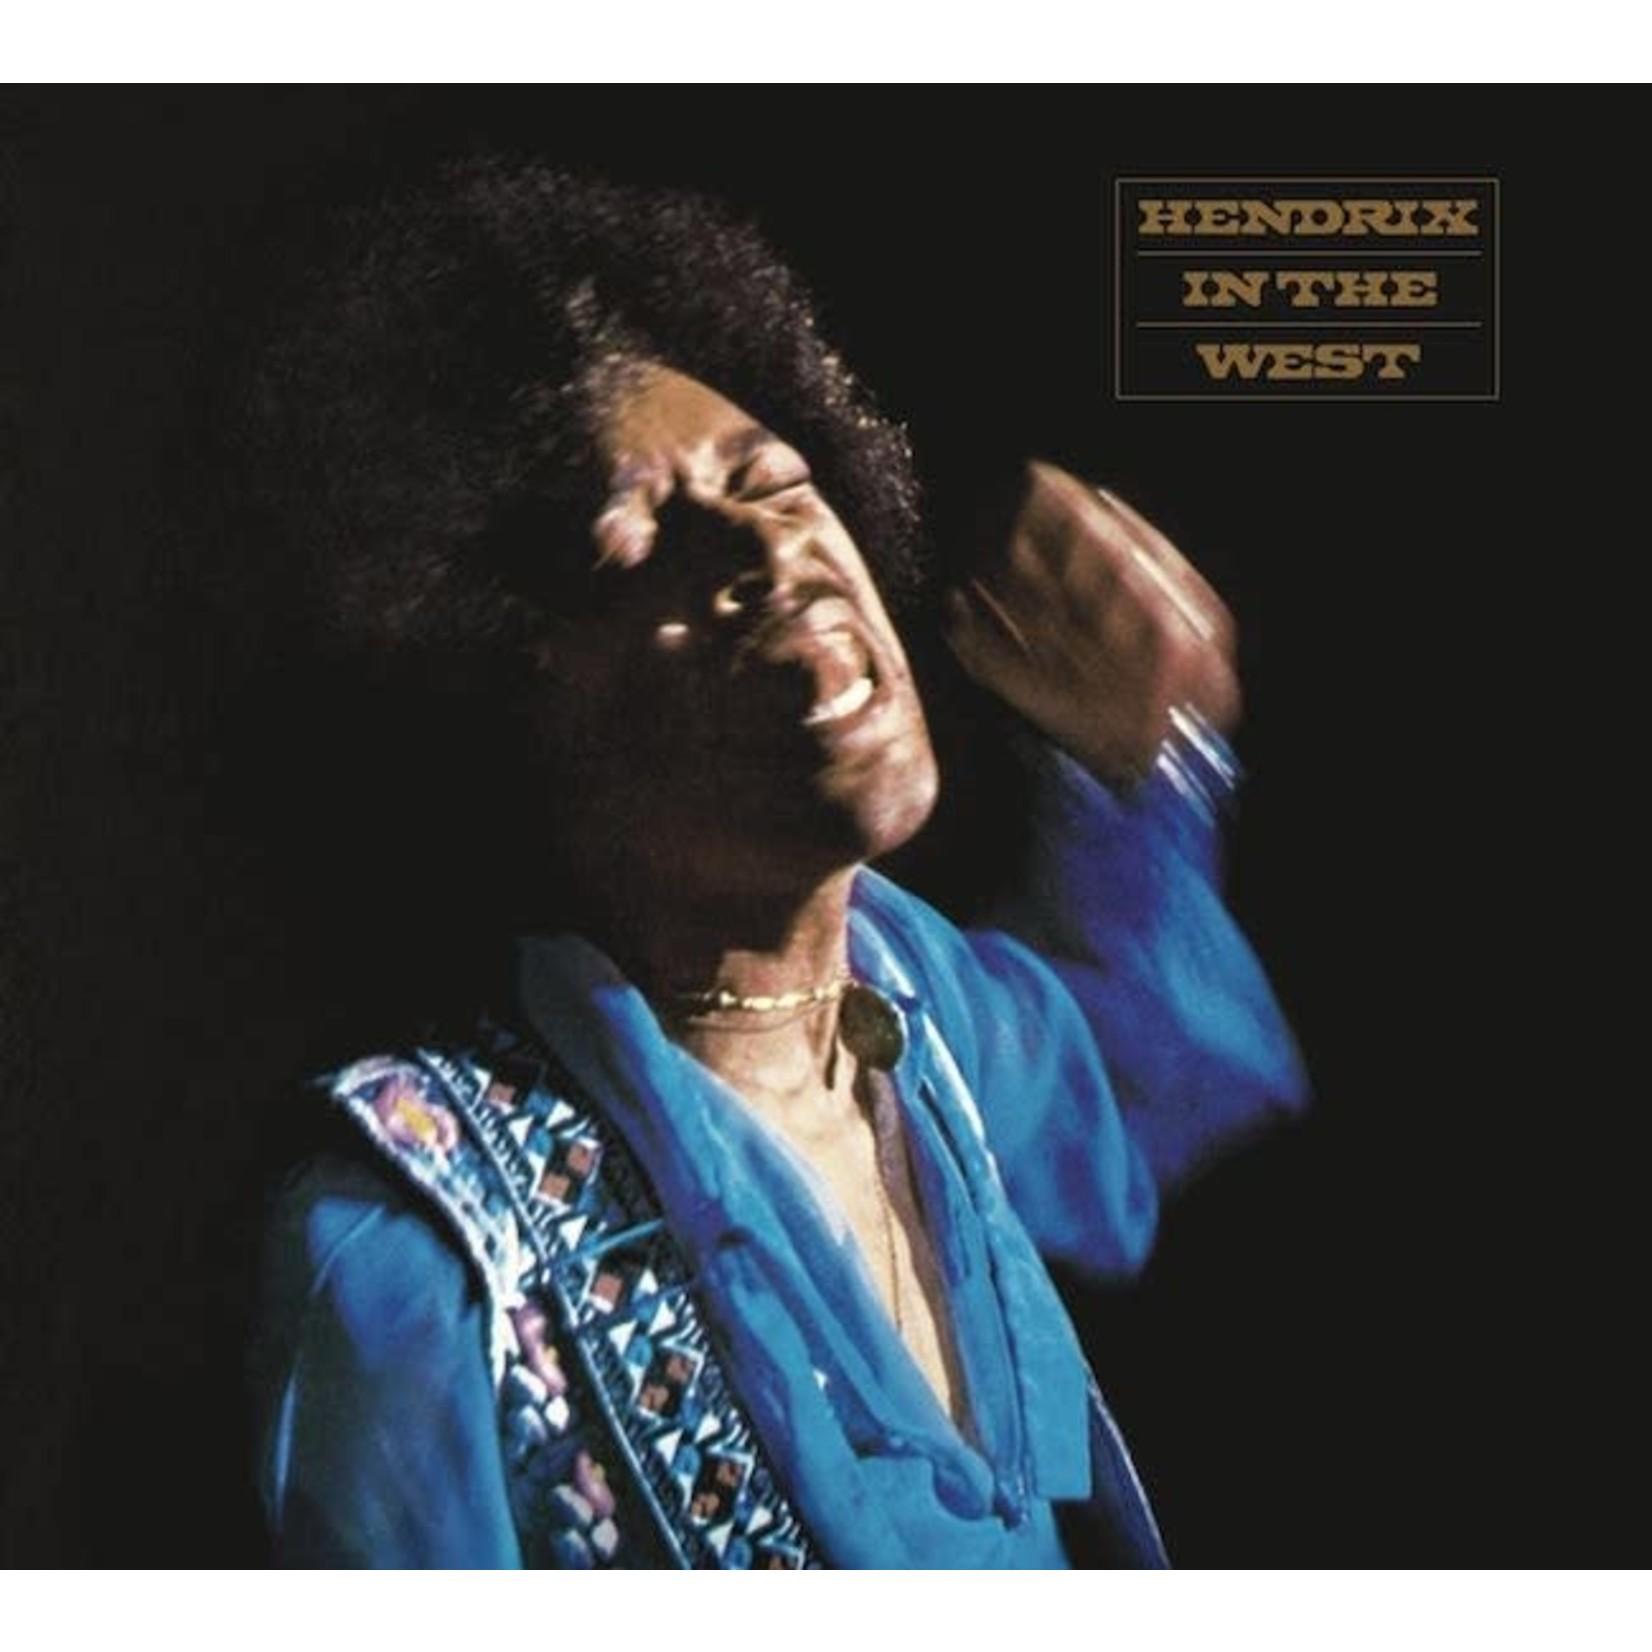 [Vintage] Hendrix, Jimi: In the West